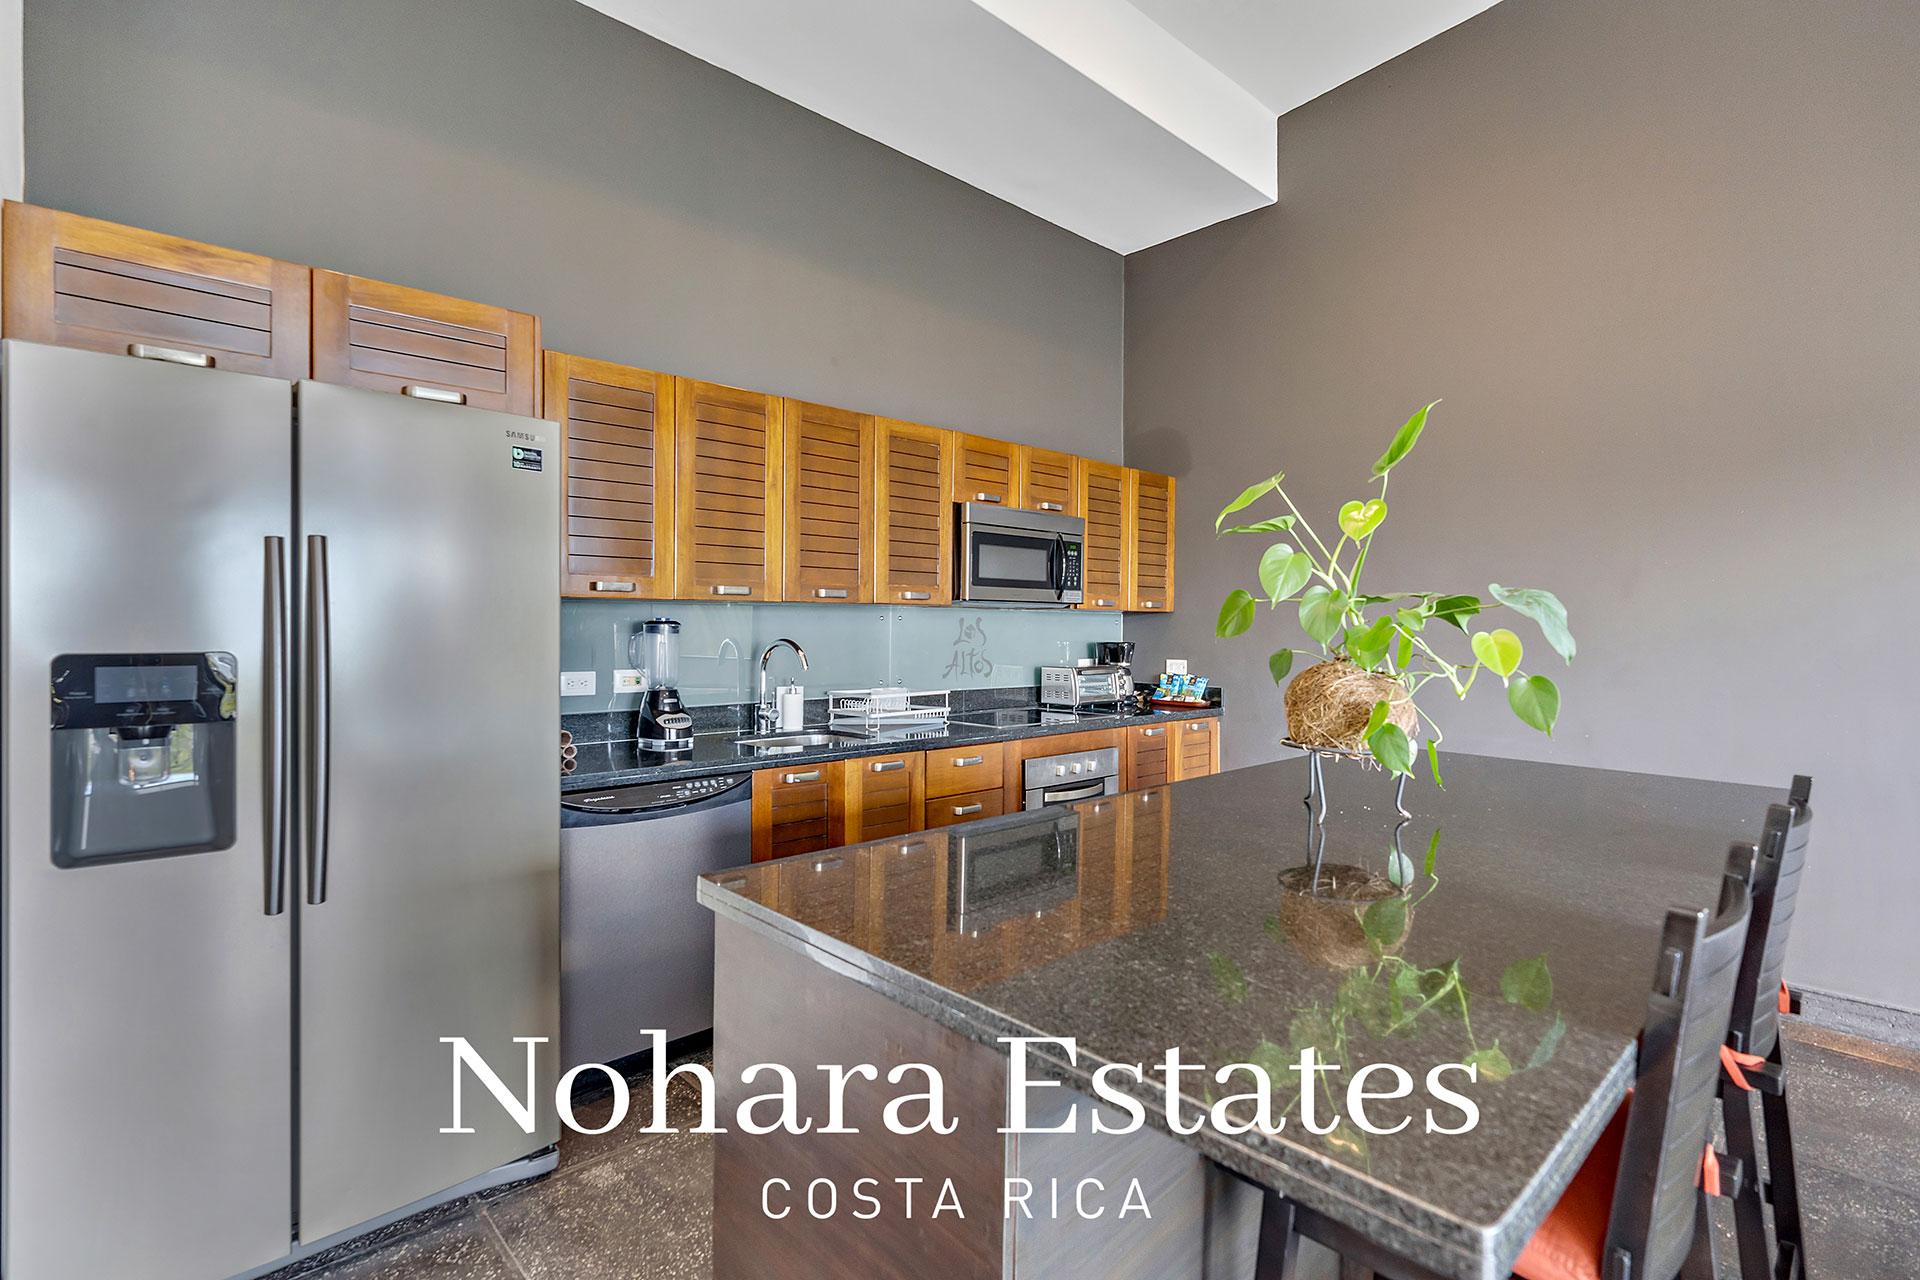 Nohara Estates Costa Rica 125 Apartment Quepos Los Altos 12